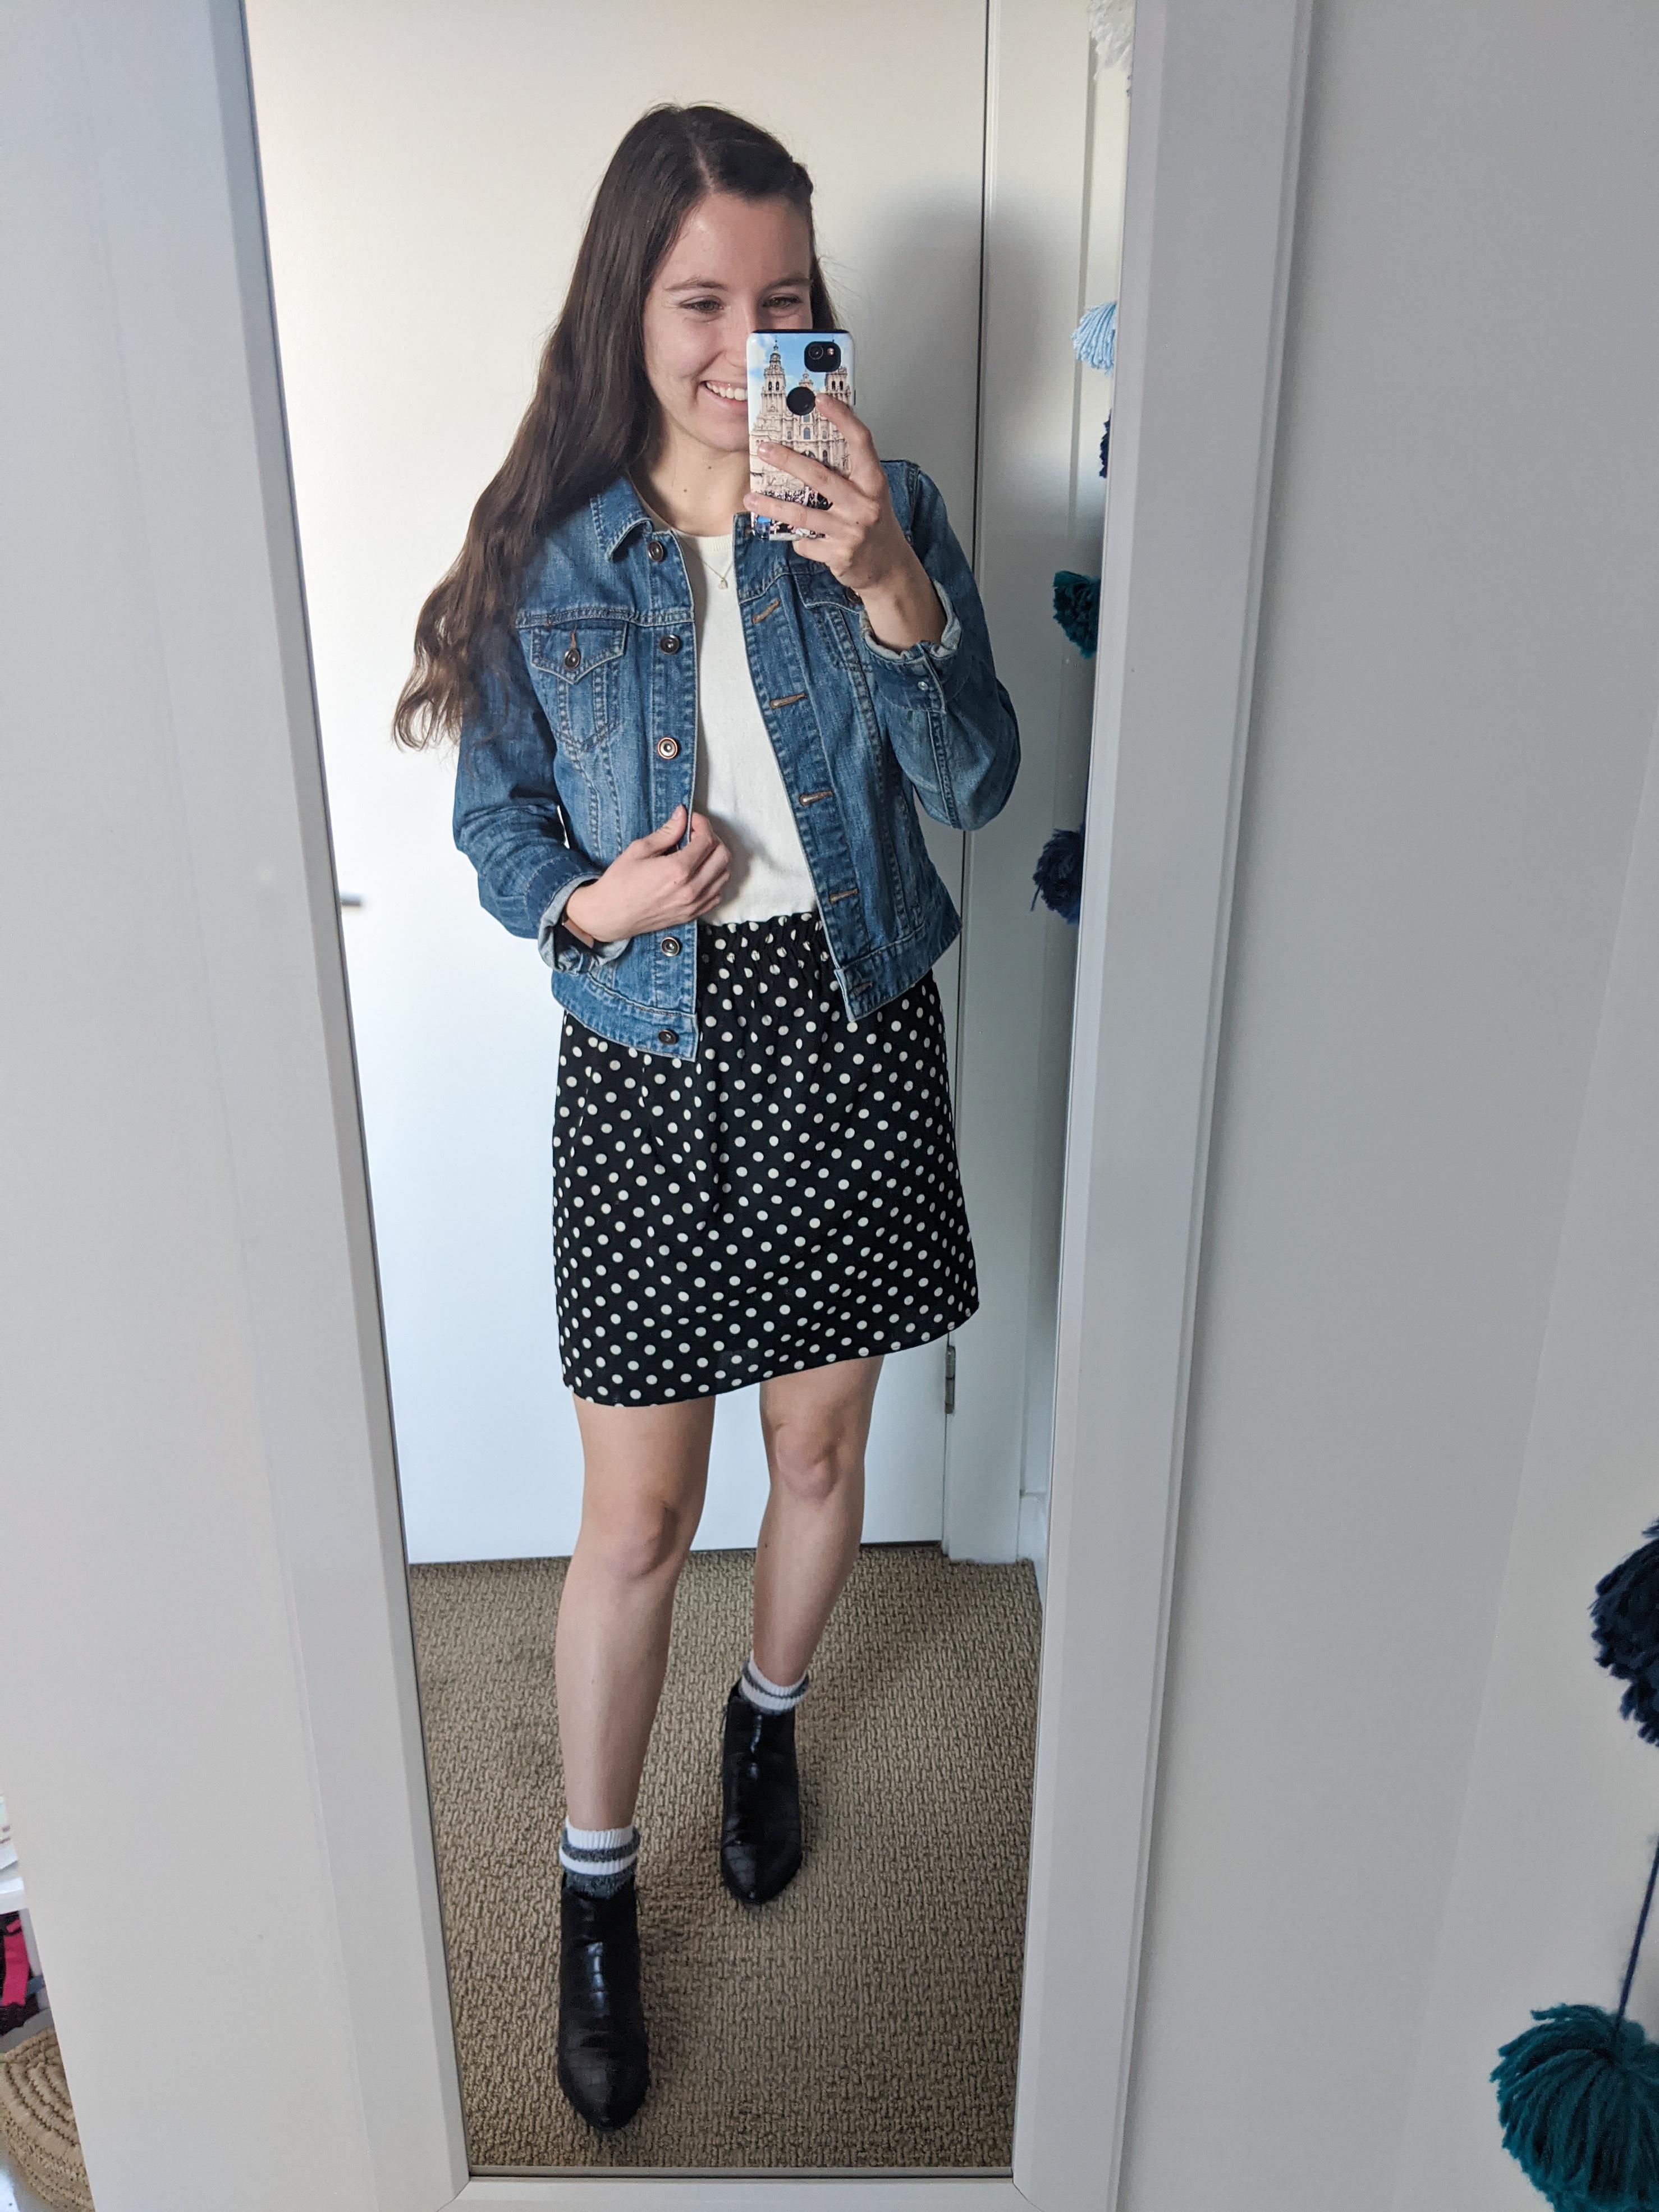 polka-dot-skirt-jean-jacket-girly-outfit